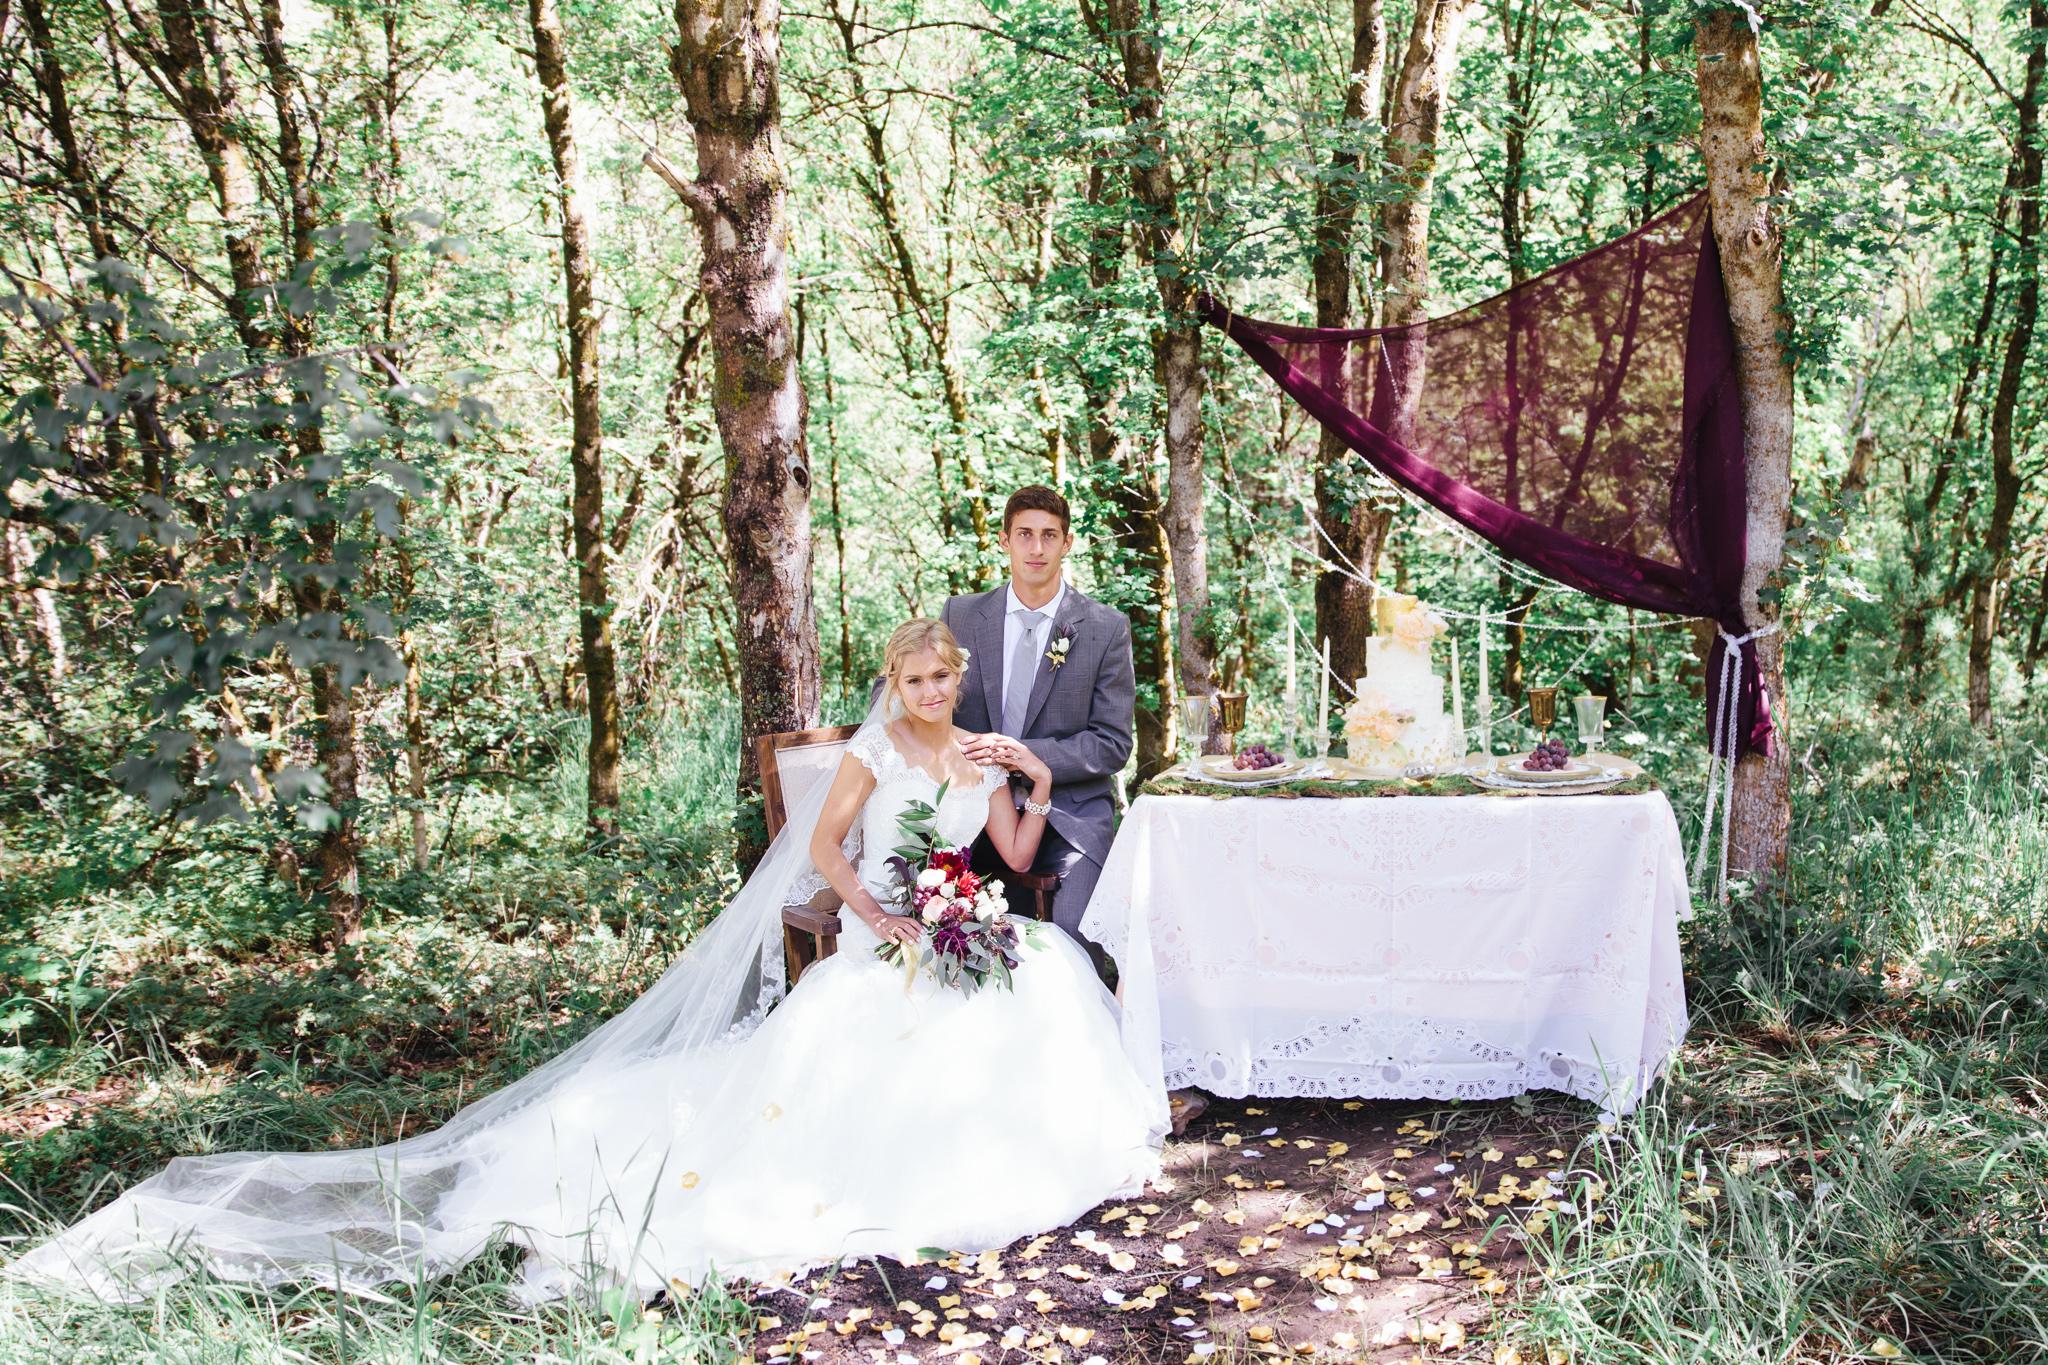 cami_kaye_photography_bridal_photographer-18.jpg